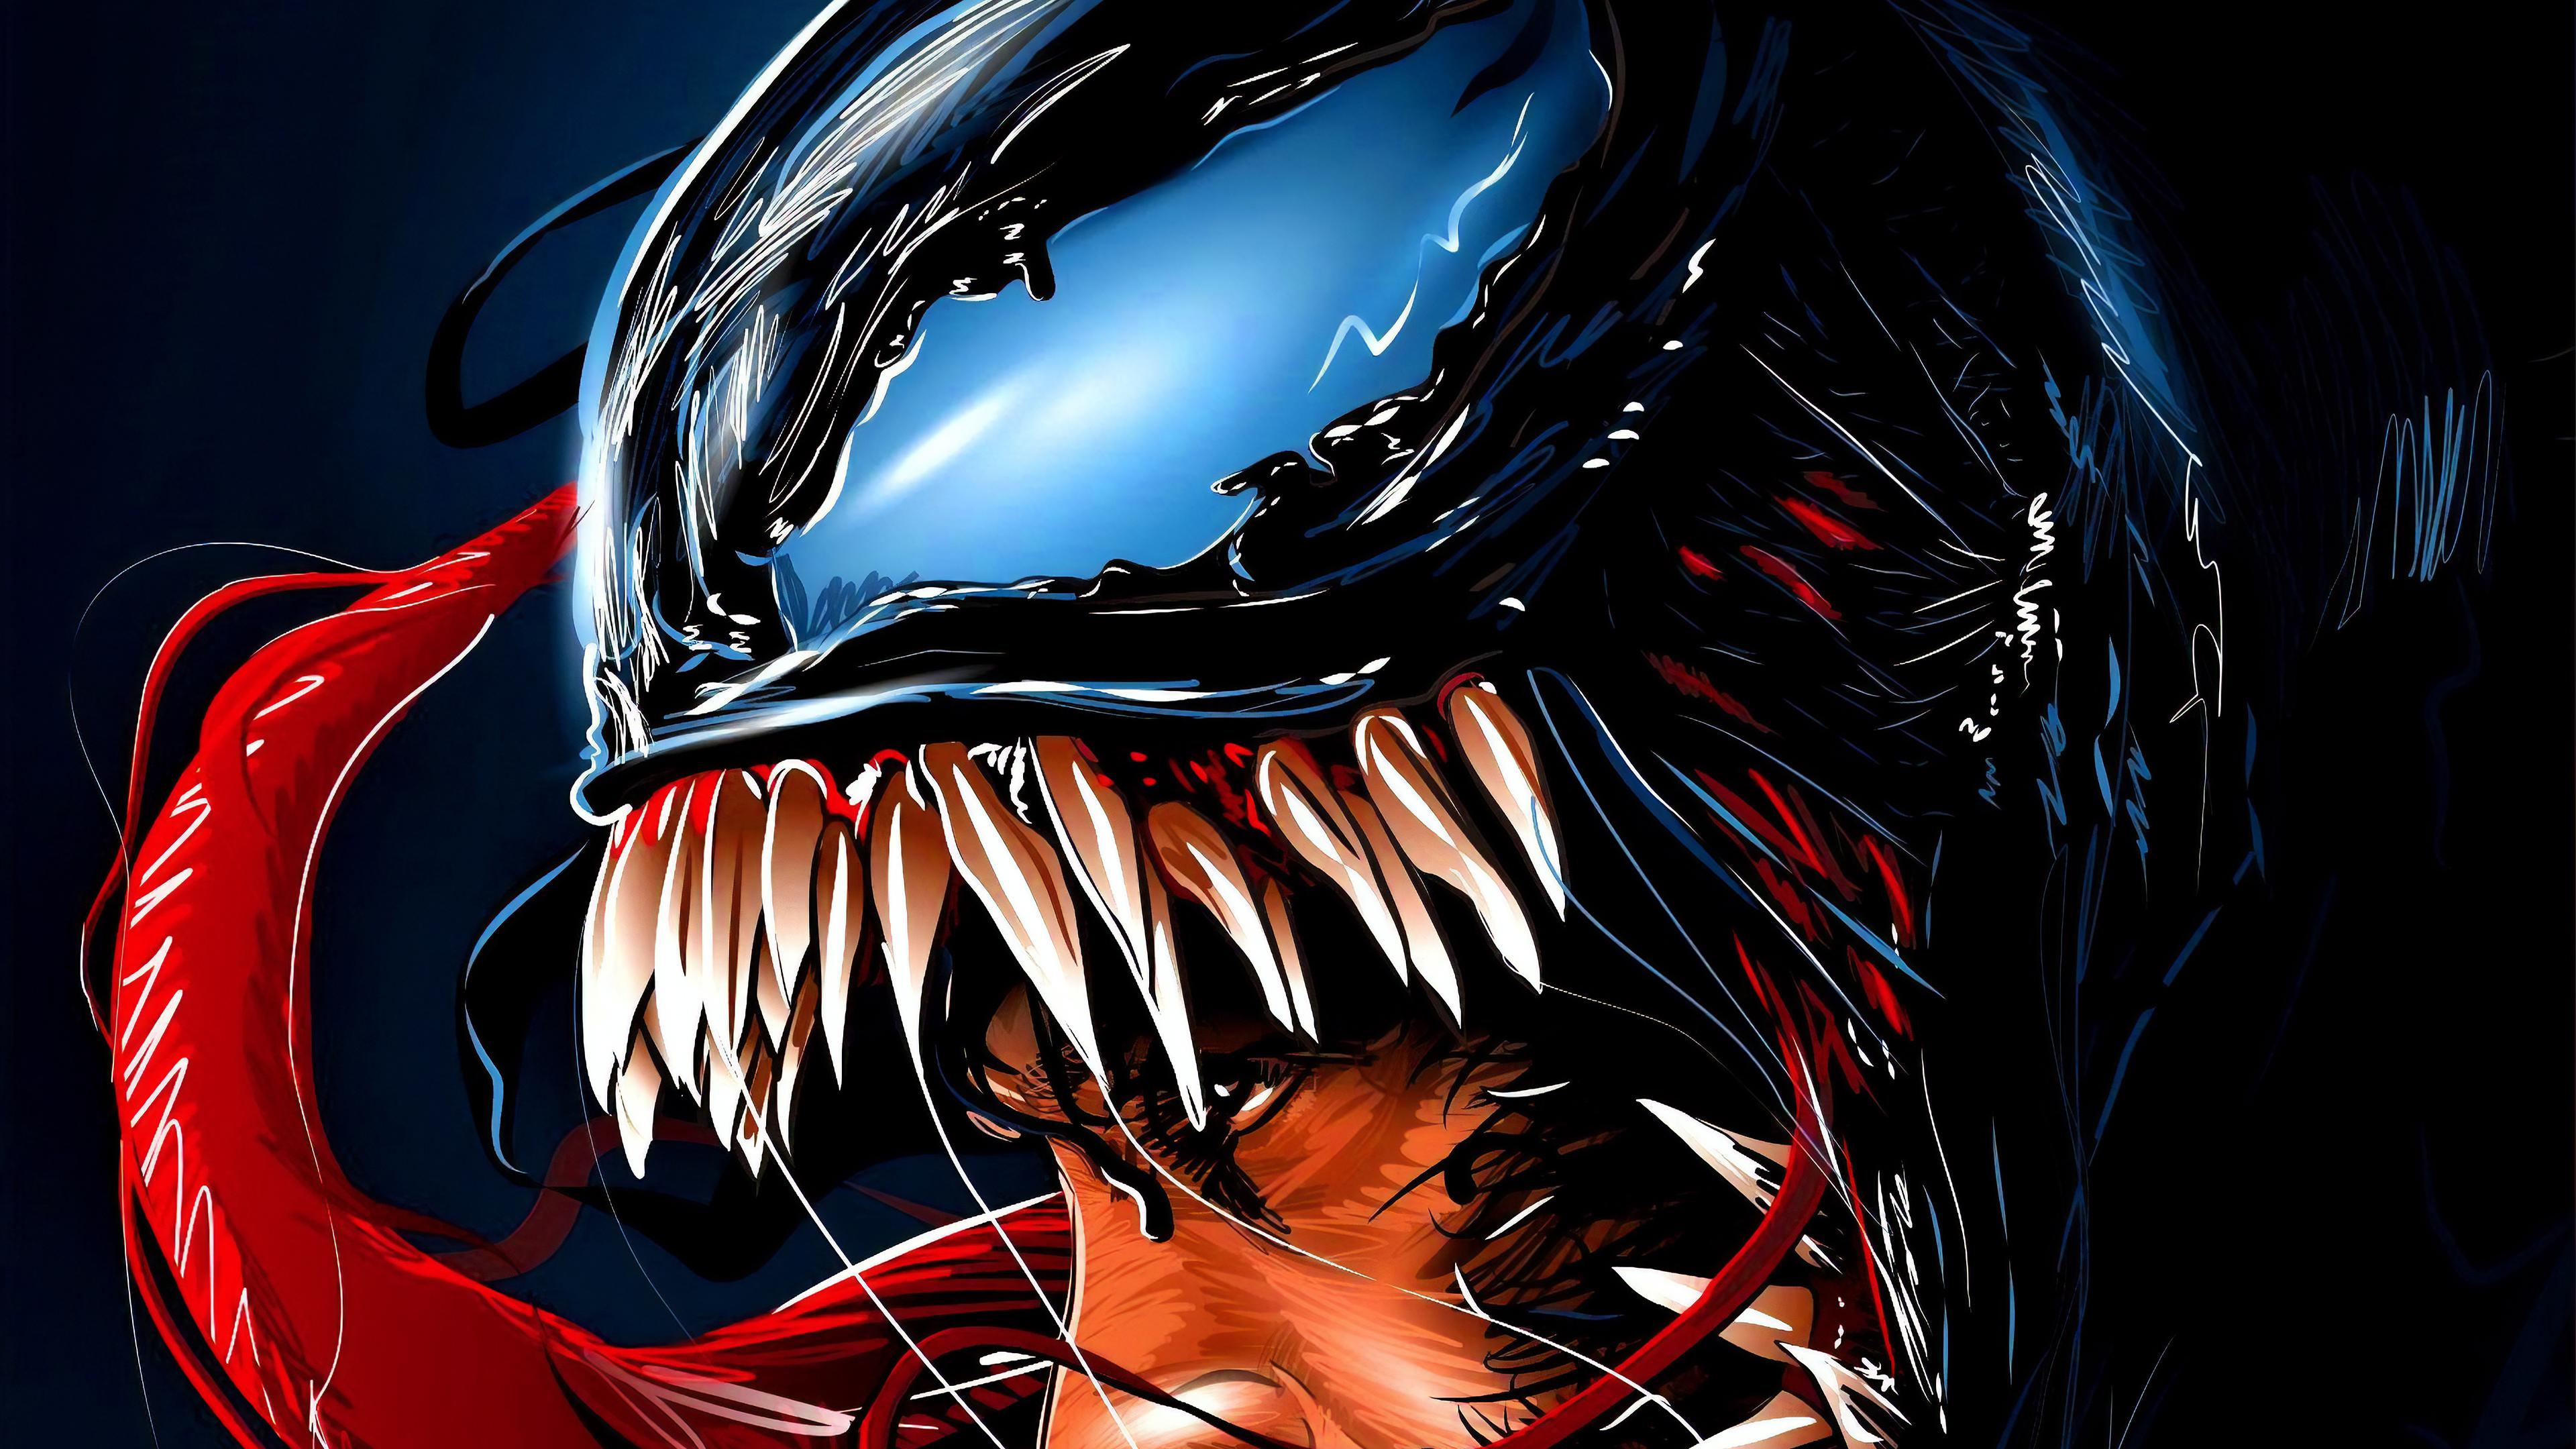 Venom Digitalart 4k, HD Superheroes, 4k Wallpapers, Images ...